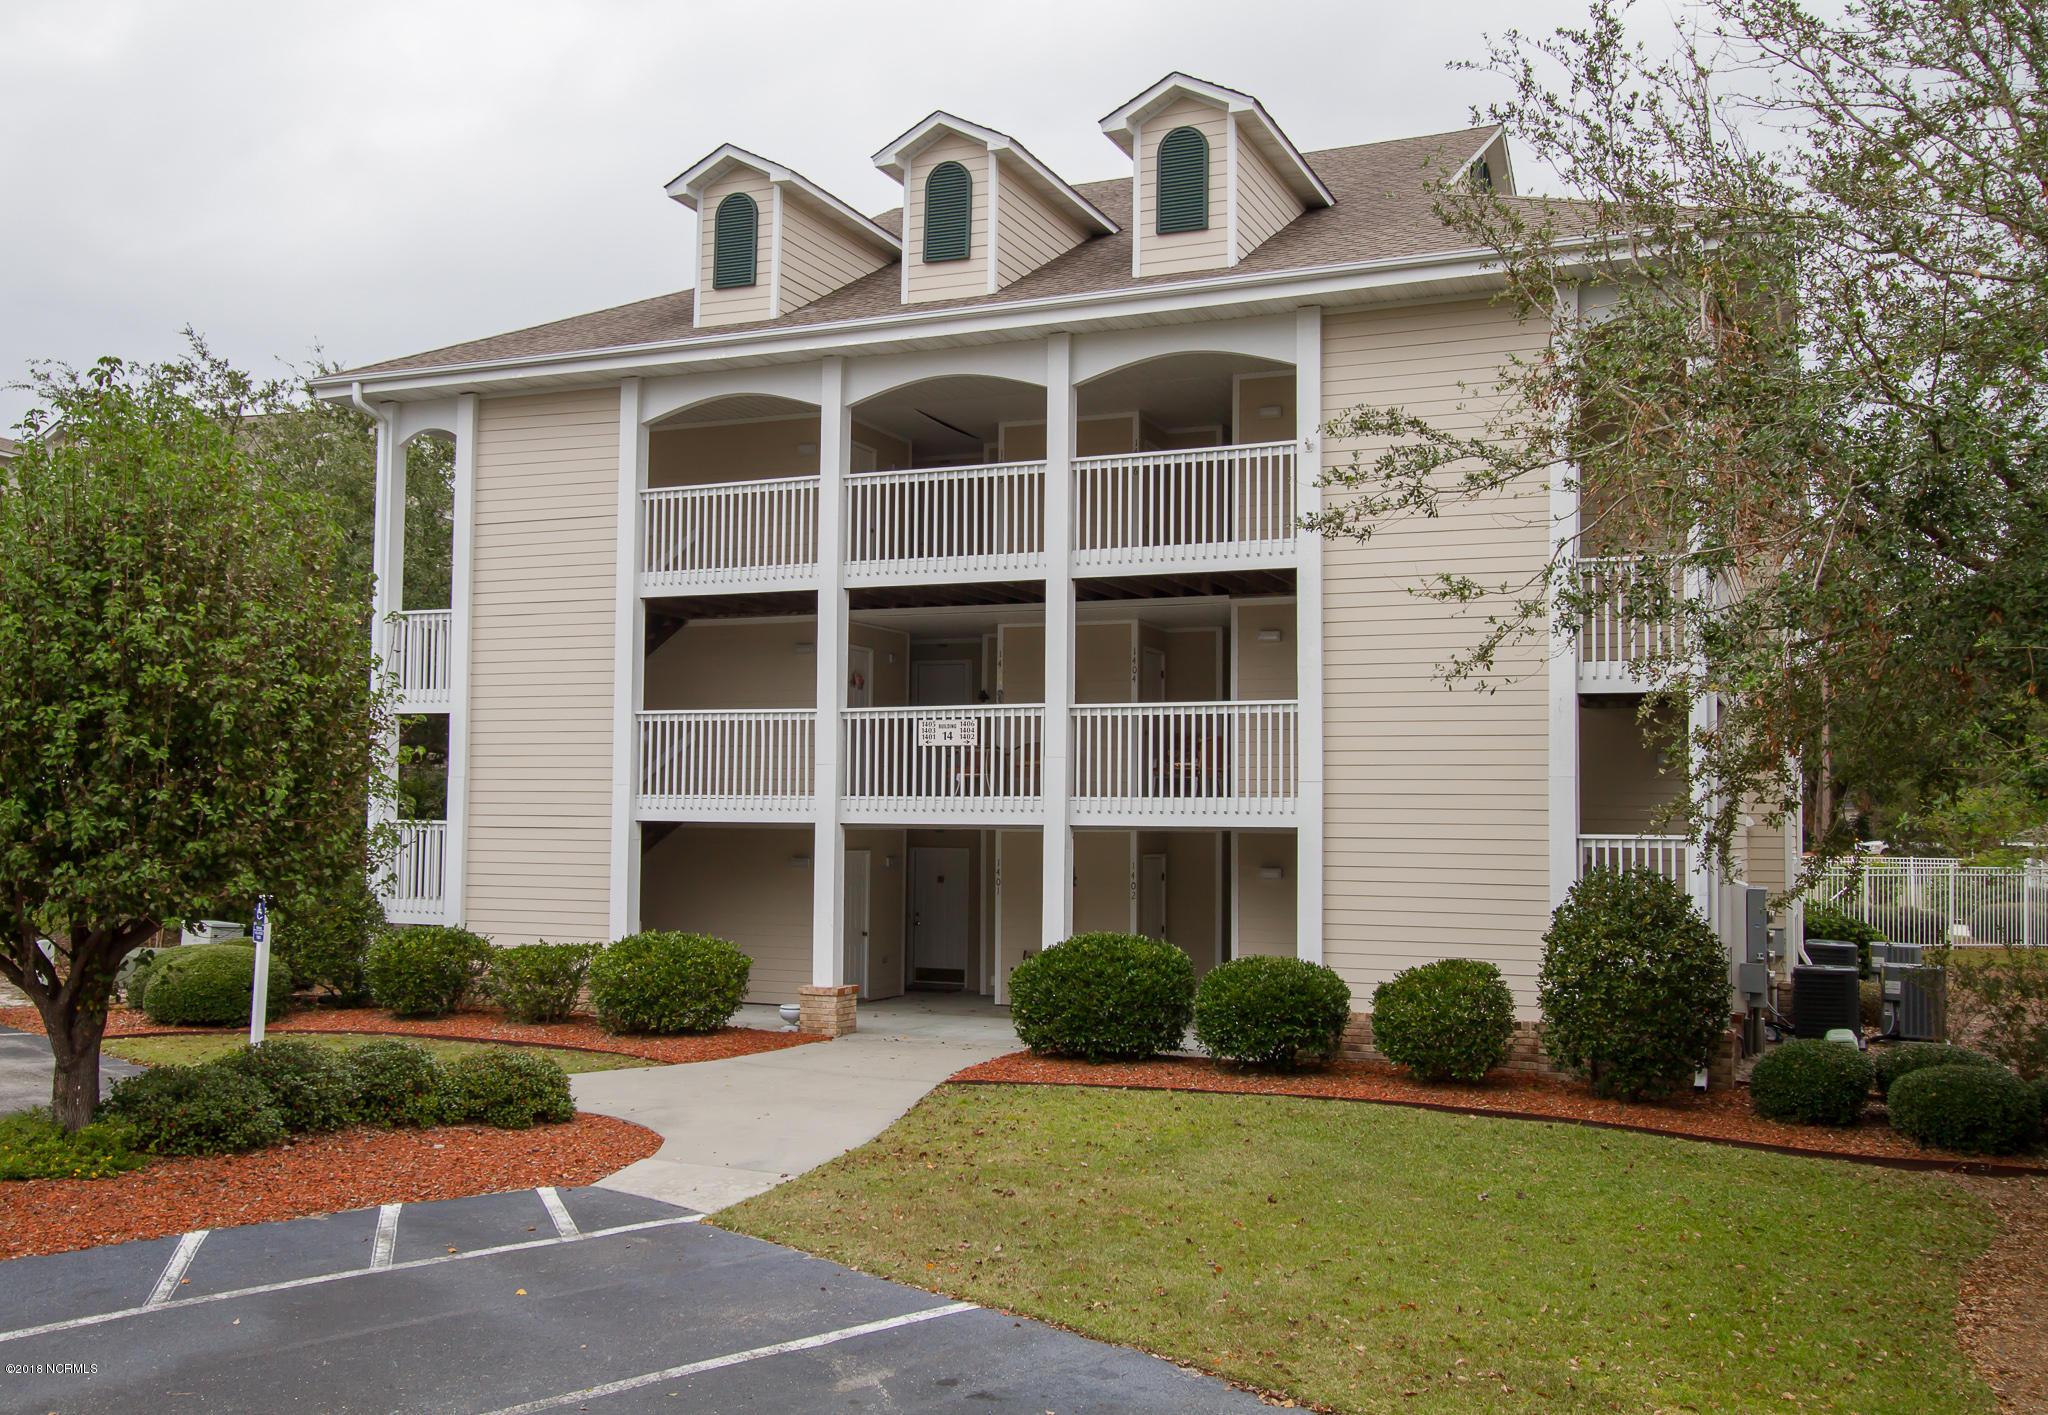 Carolina Plantations Real Estate - MLS Number: 100140190